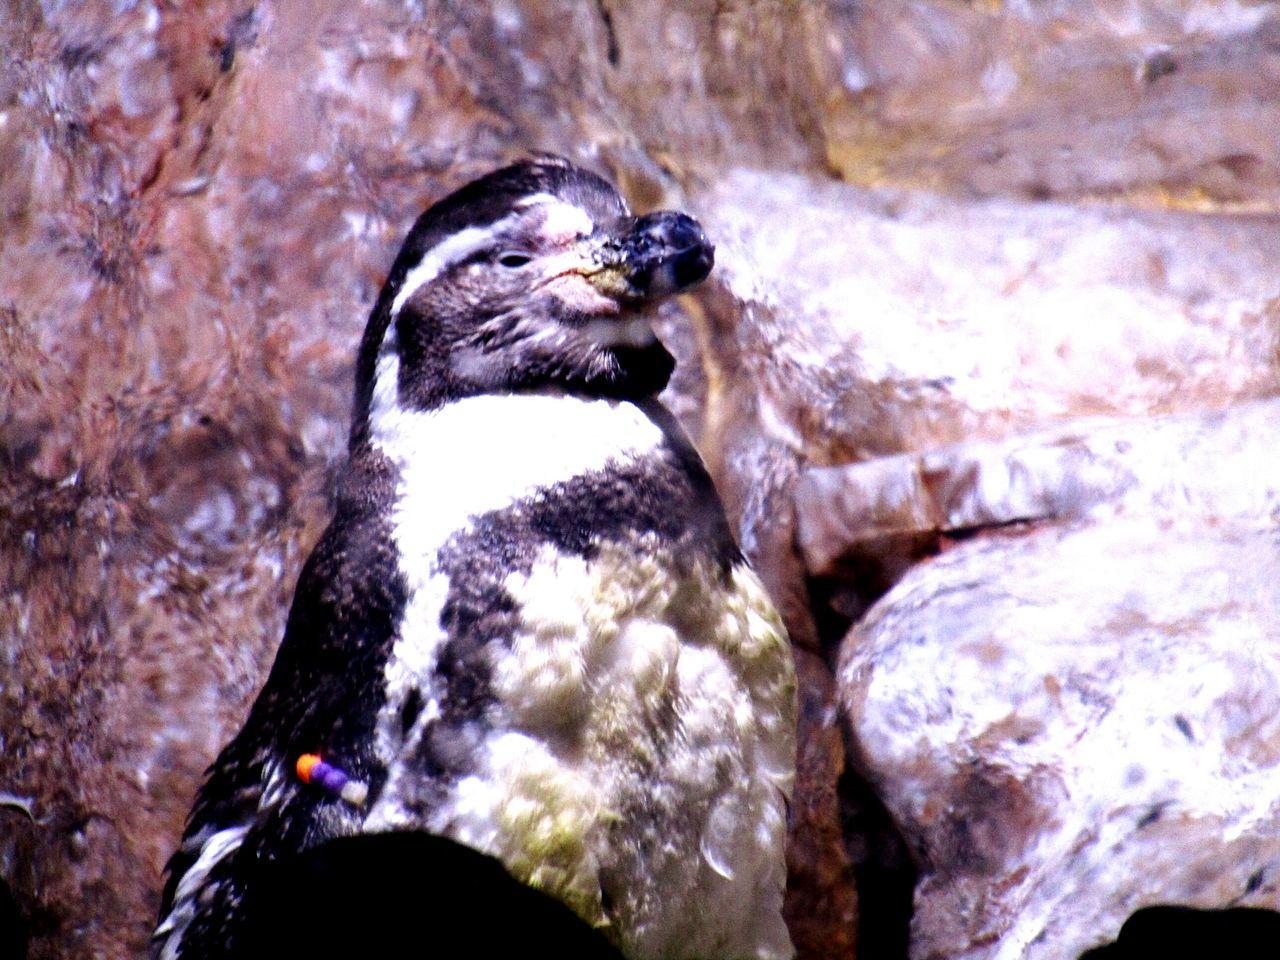 Pinguine Animalphotography Animallovers Eyeemphotography Eyeemcollection EyeEmAnimalLover Barcelona Tropicarium Aquarium Closeupshot Todayphotography